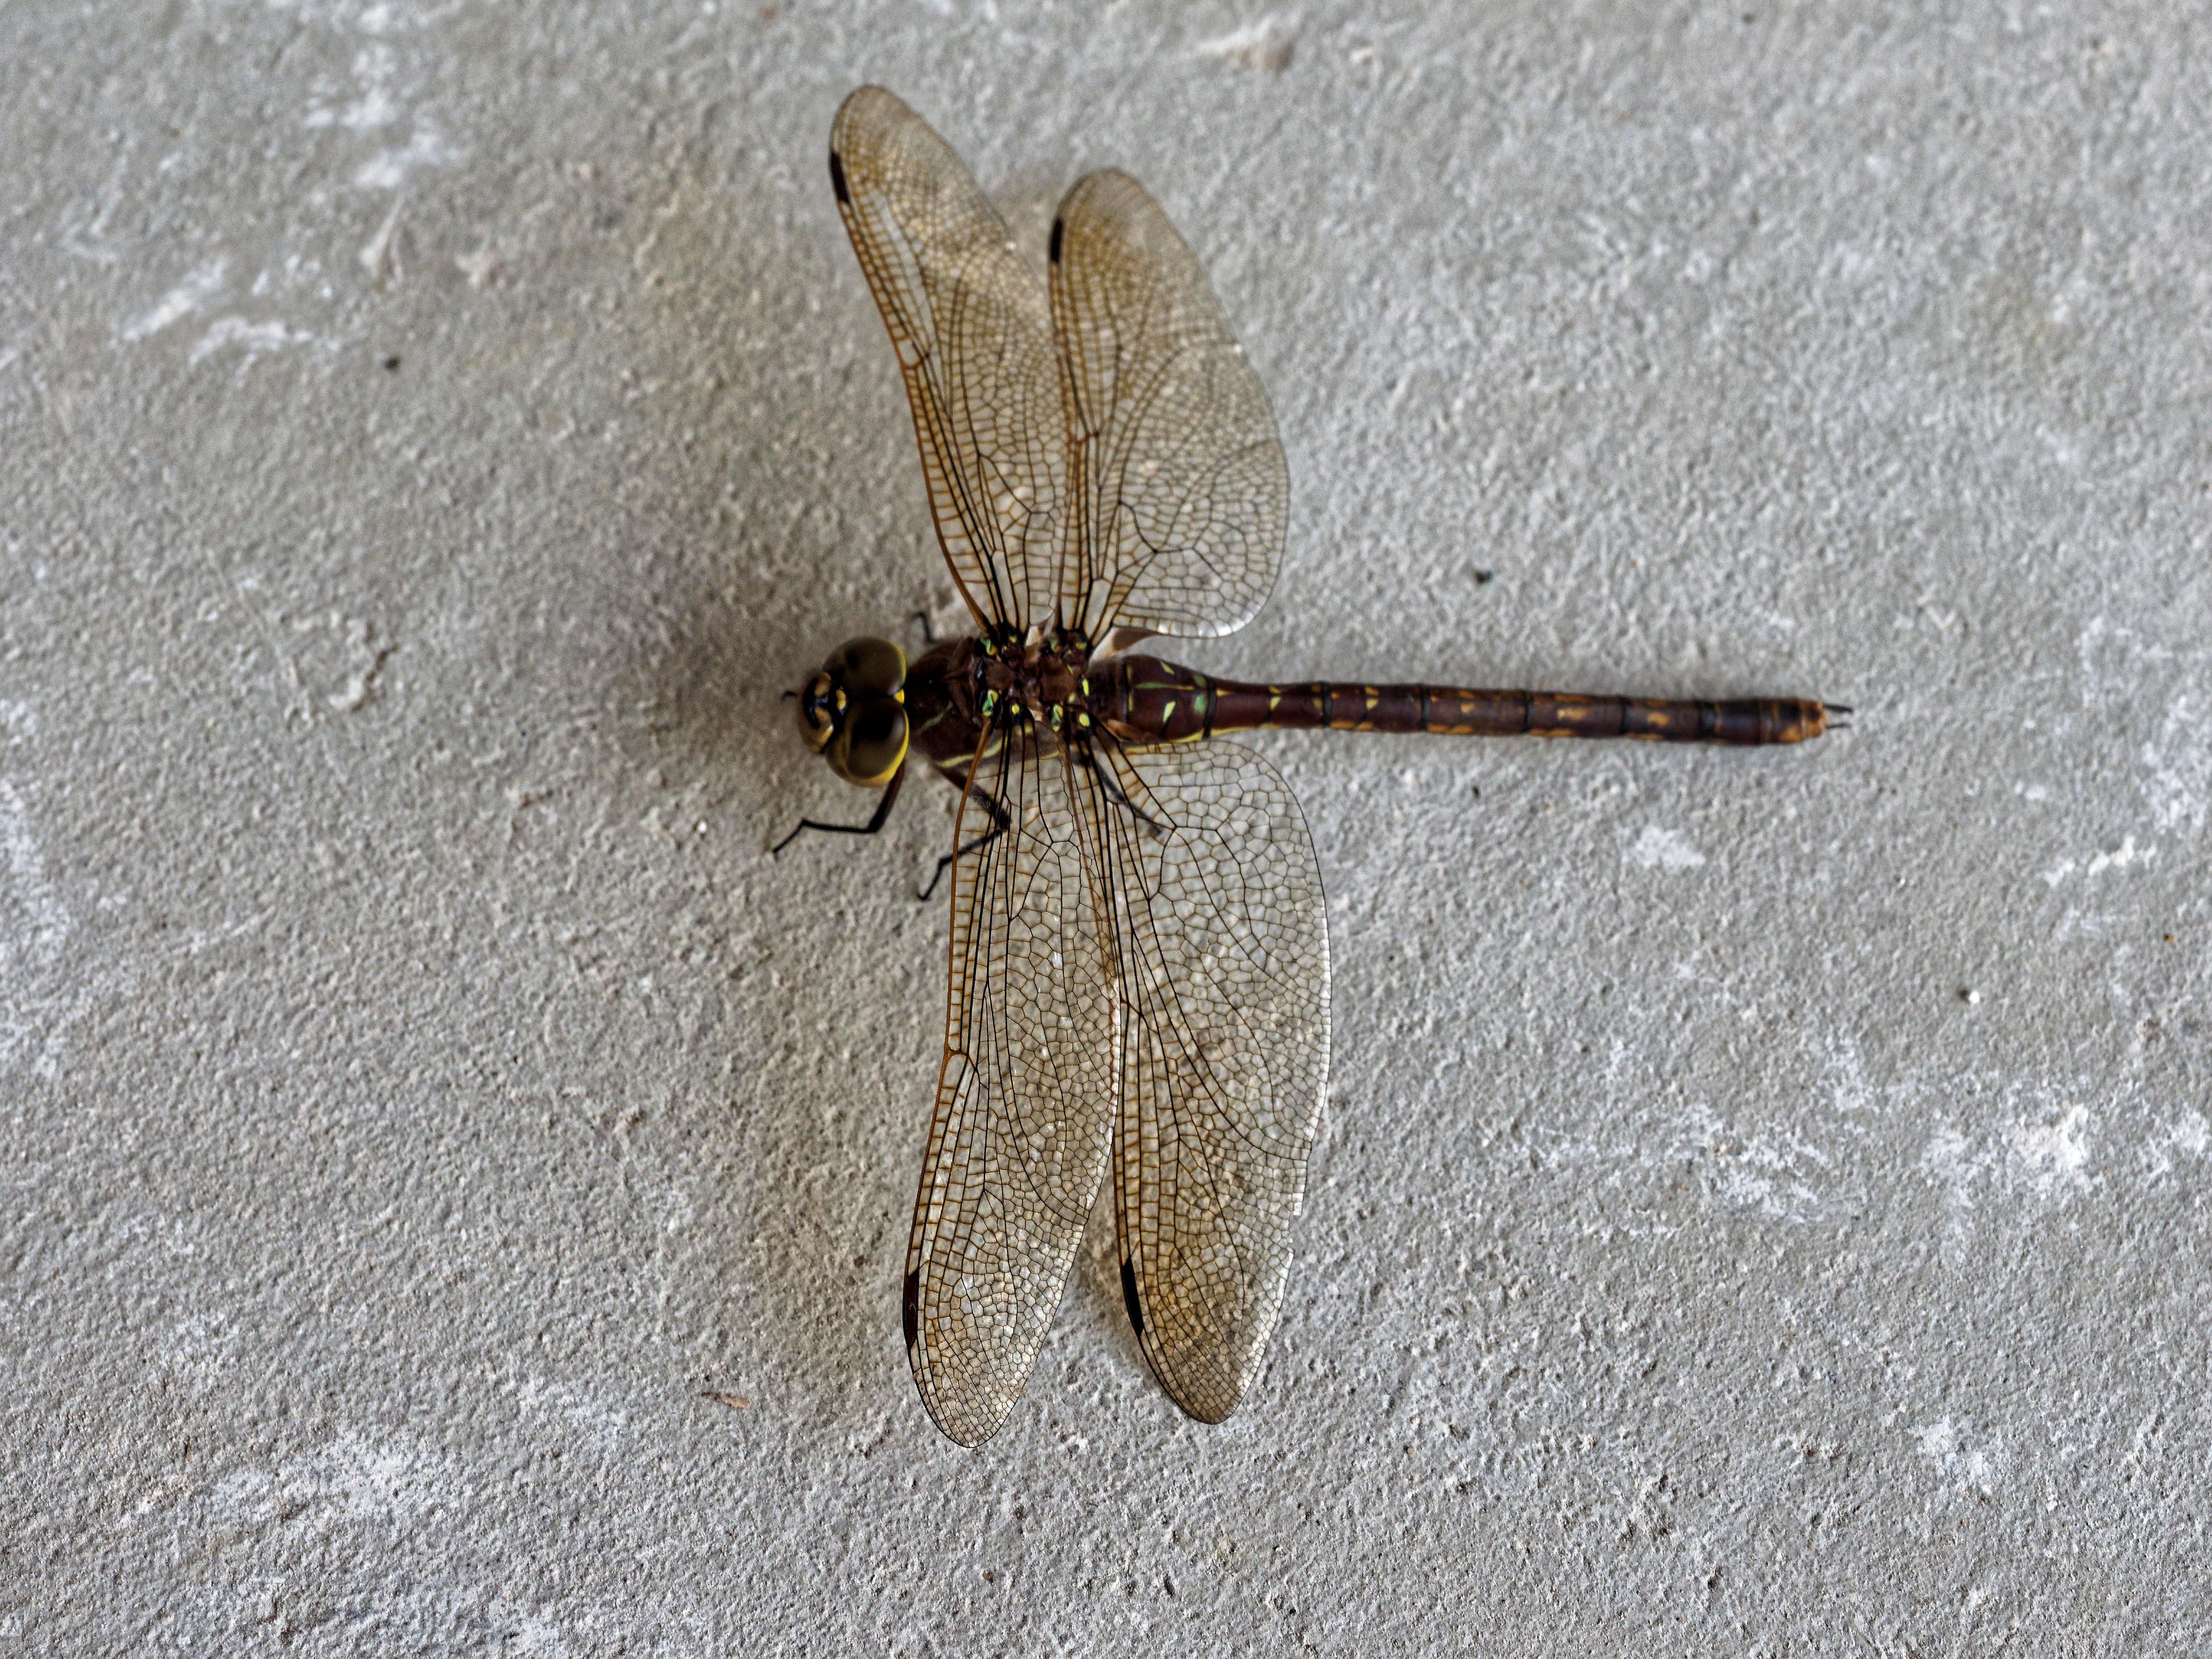 Dragon-fly-2.jpeg